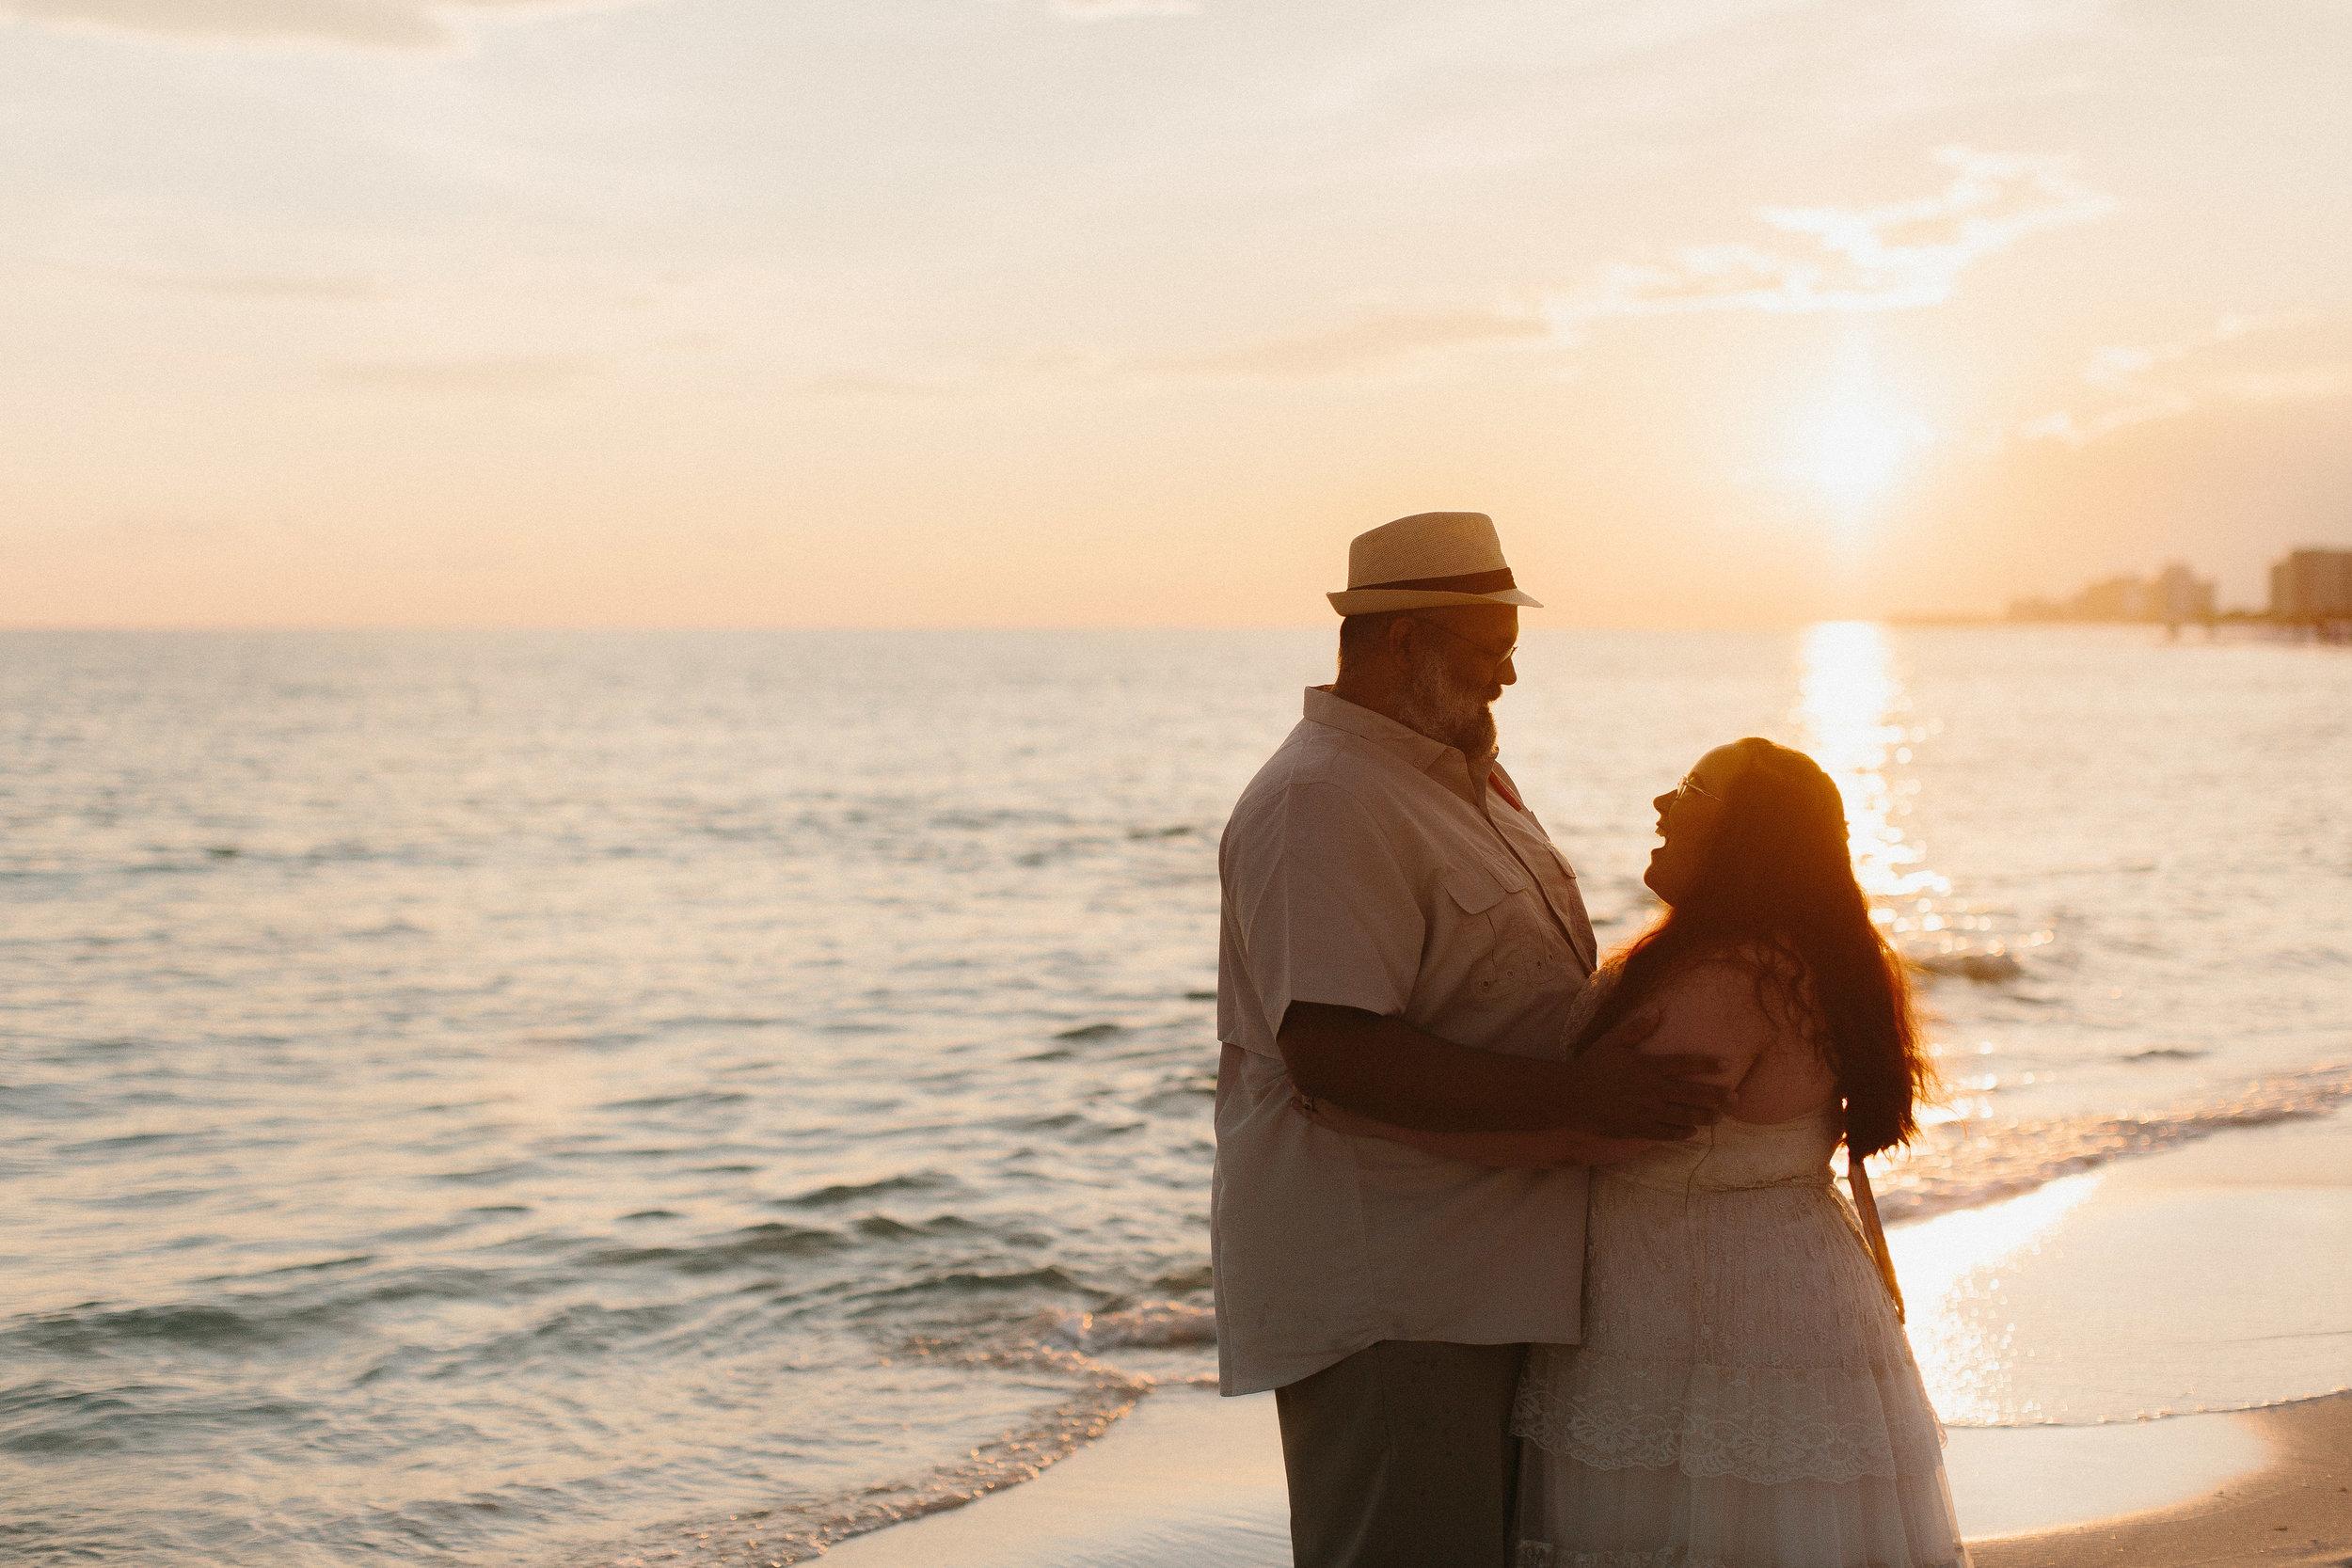 destin_sunset_beach_elopement_intimate_wedding_photographer_florida_documentary_1305.jpg